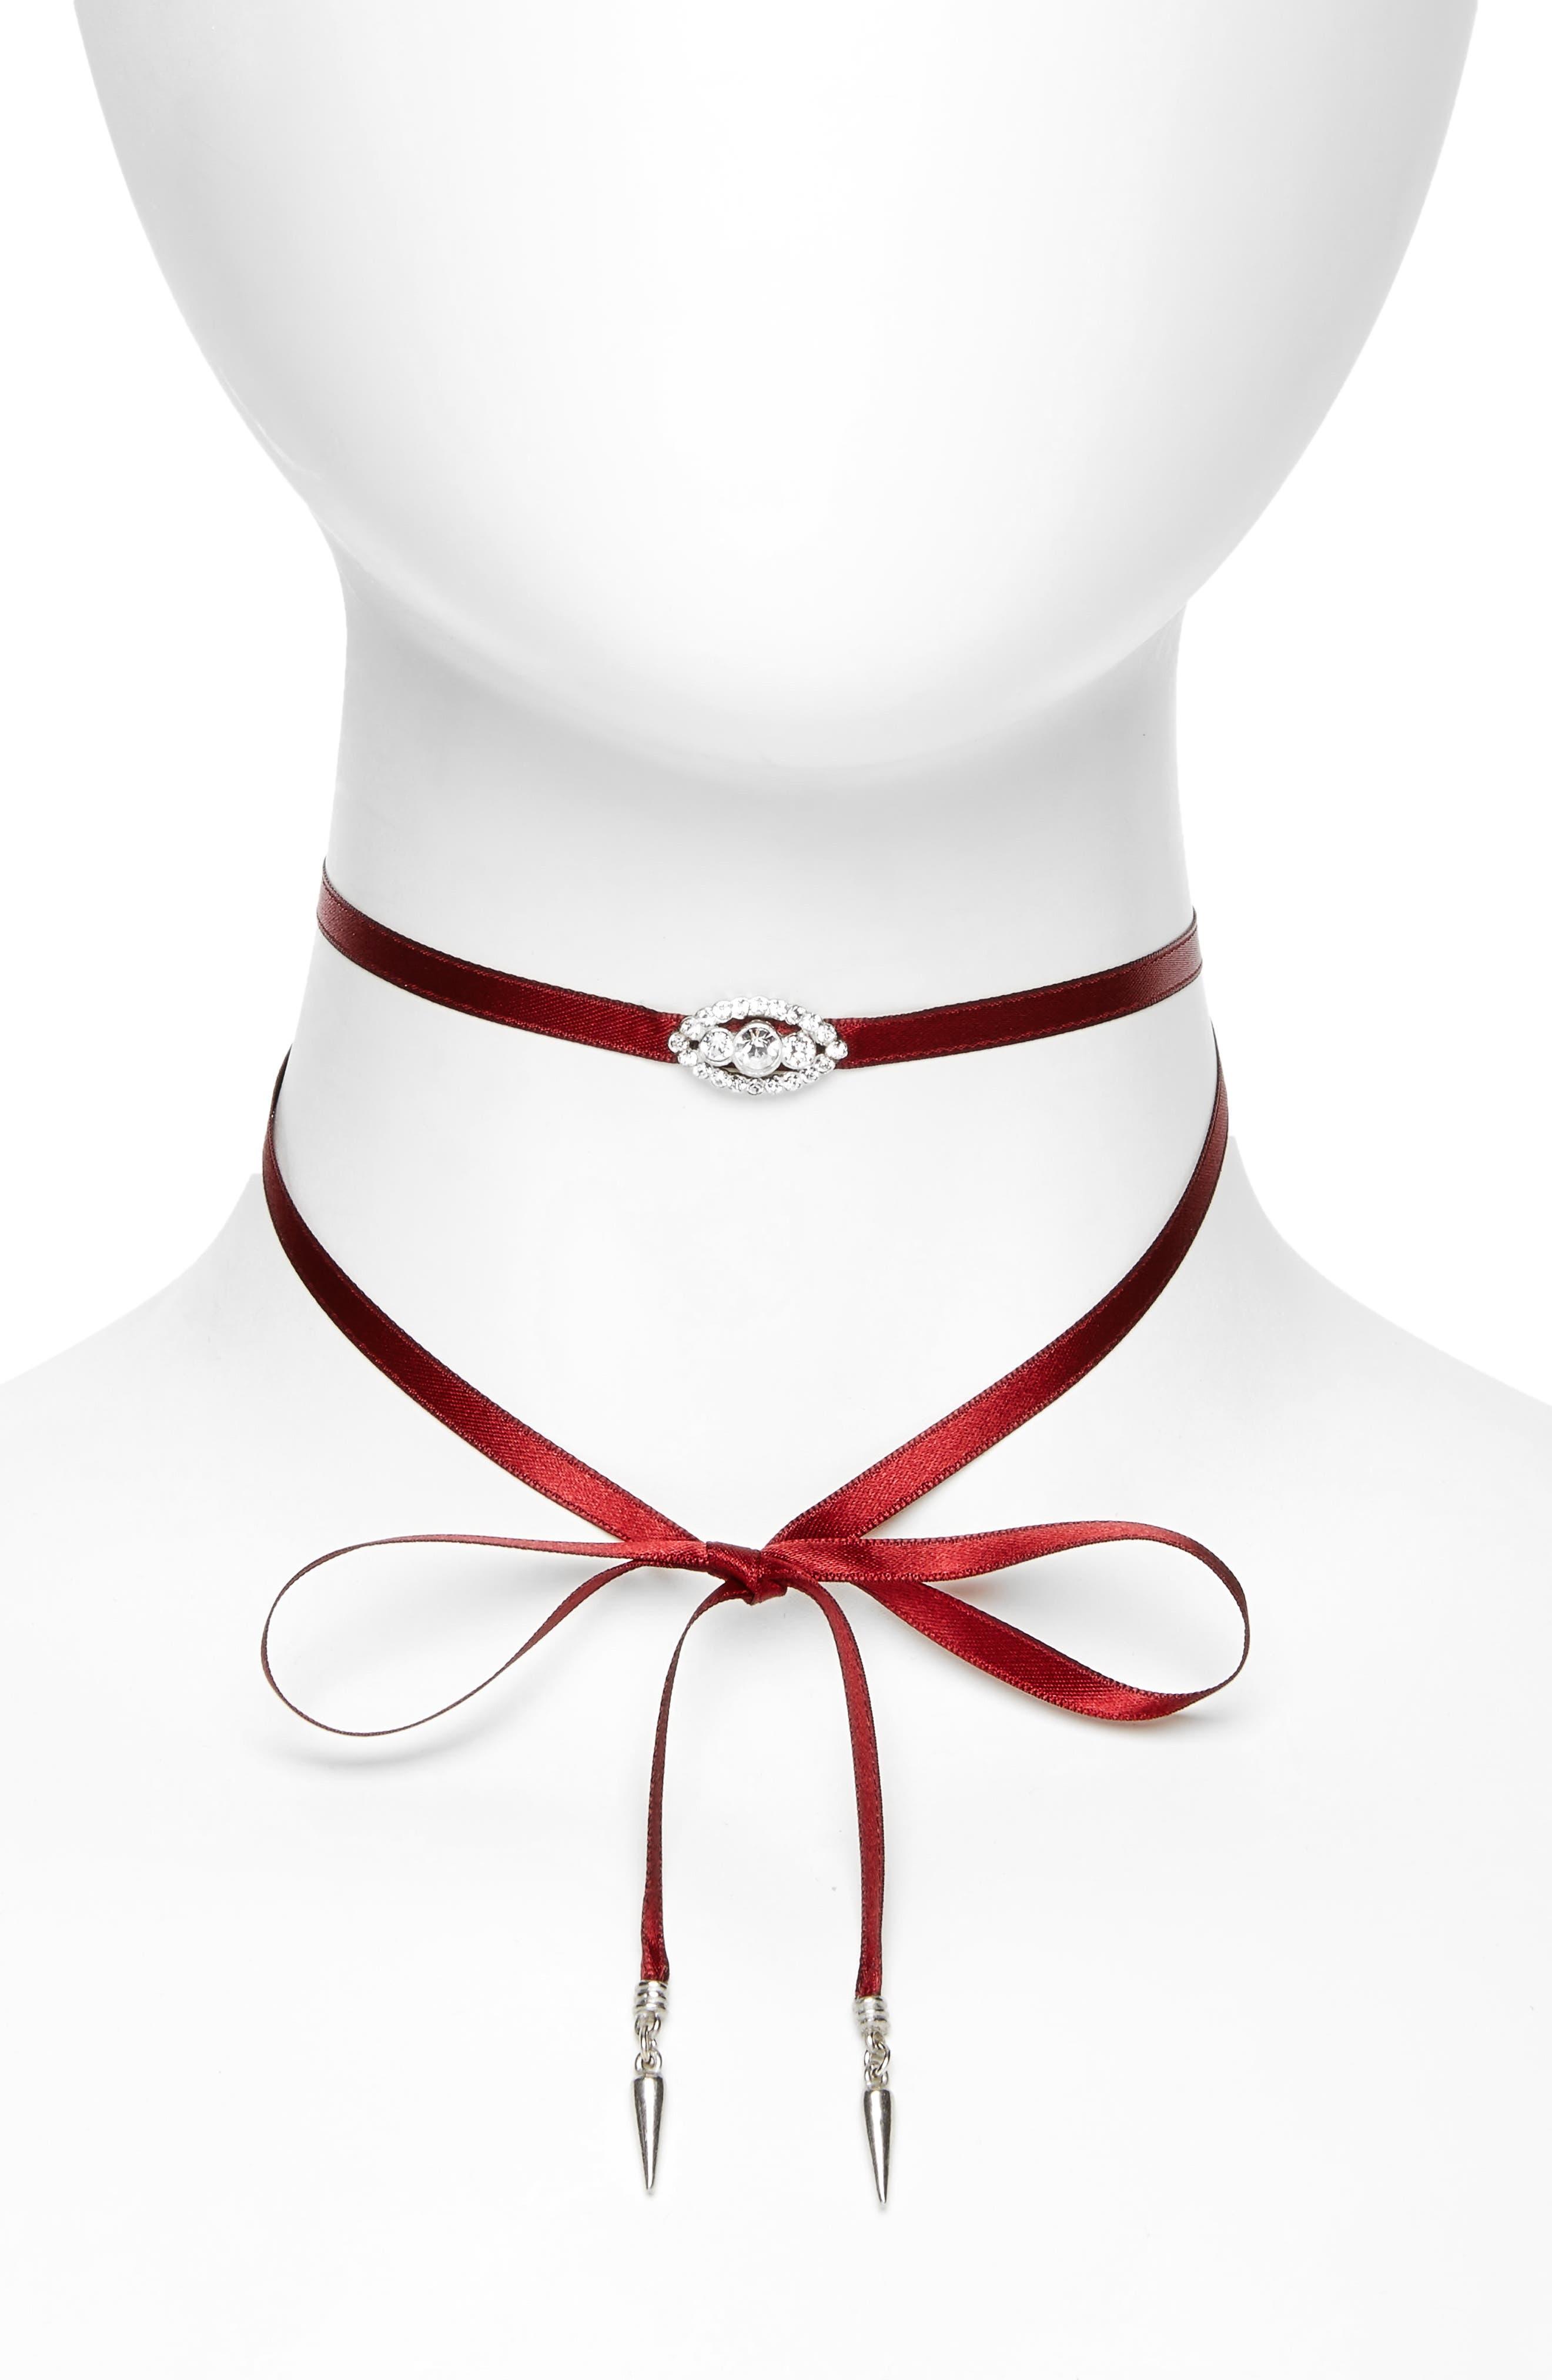 Wrap Choker Necklace,                             Main thumbnail 1, color,                             BURGUNDY / SILVER